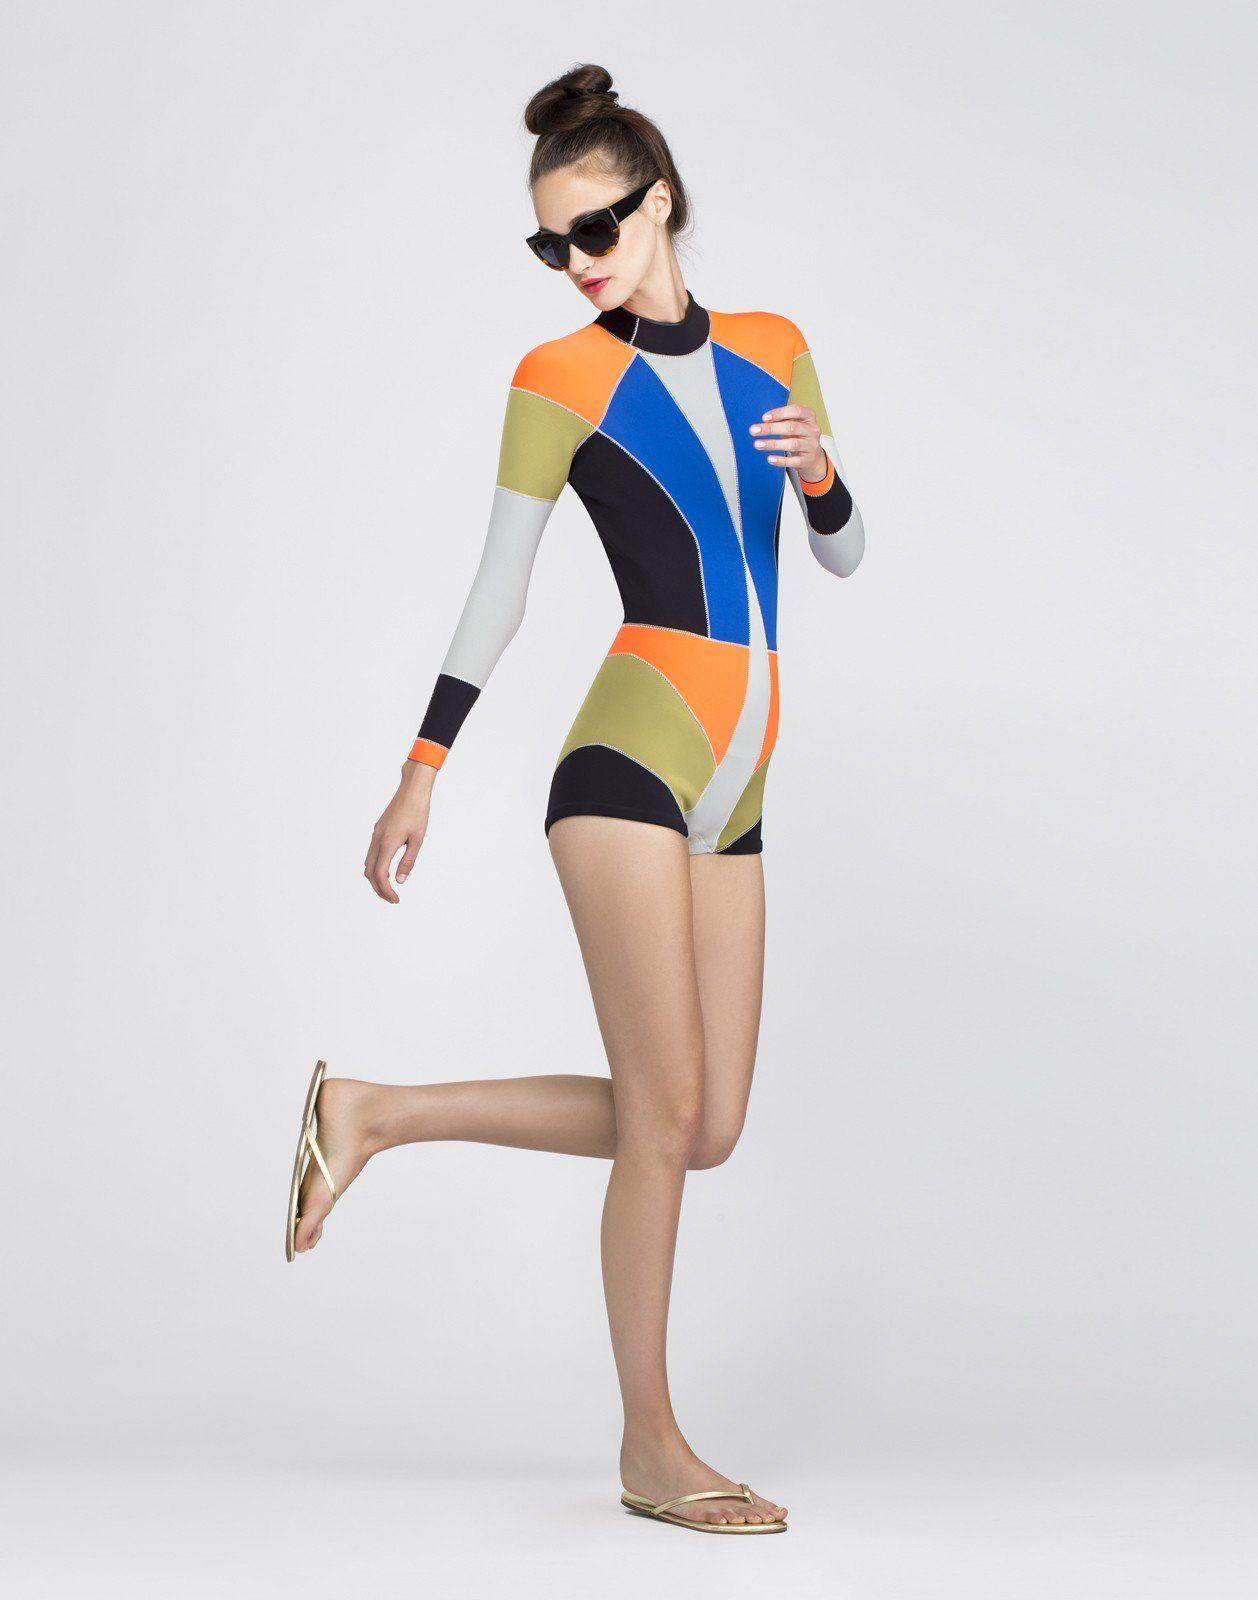 Cynthia Rowley - Cynthia Rowley x J Crew ColorBlock Wetsuit